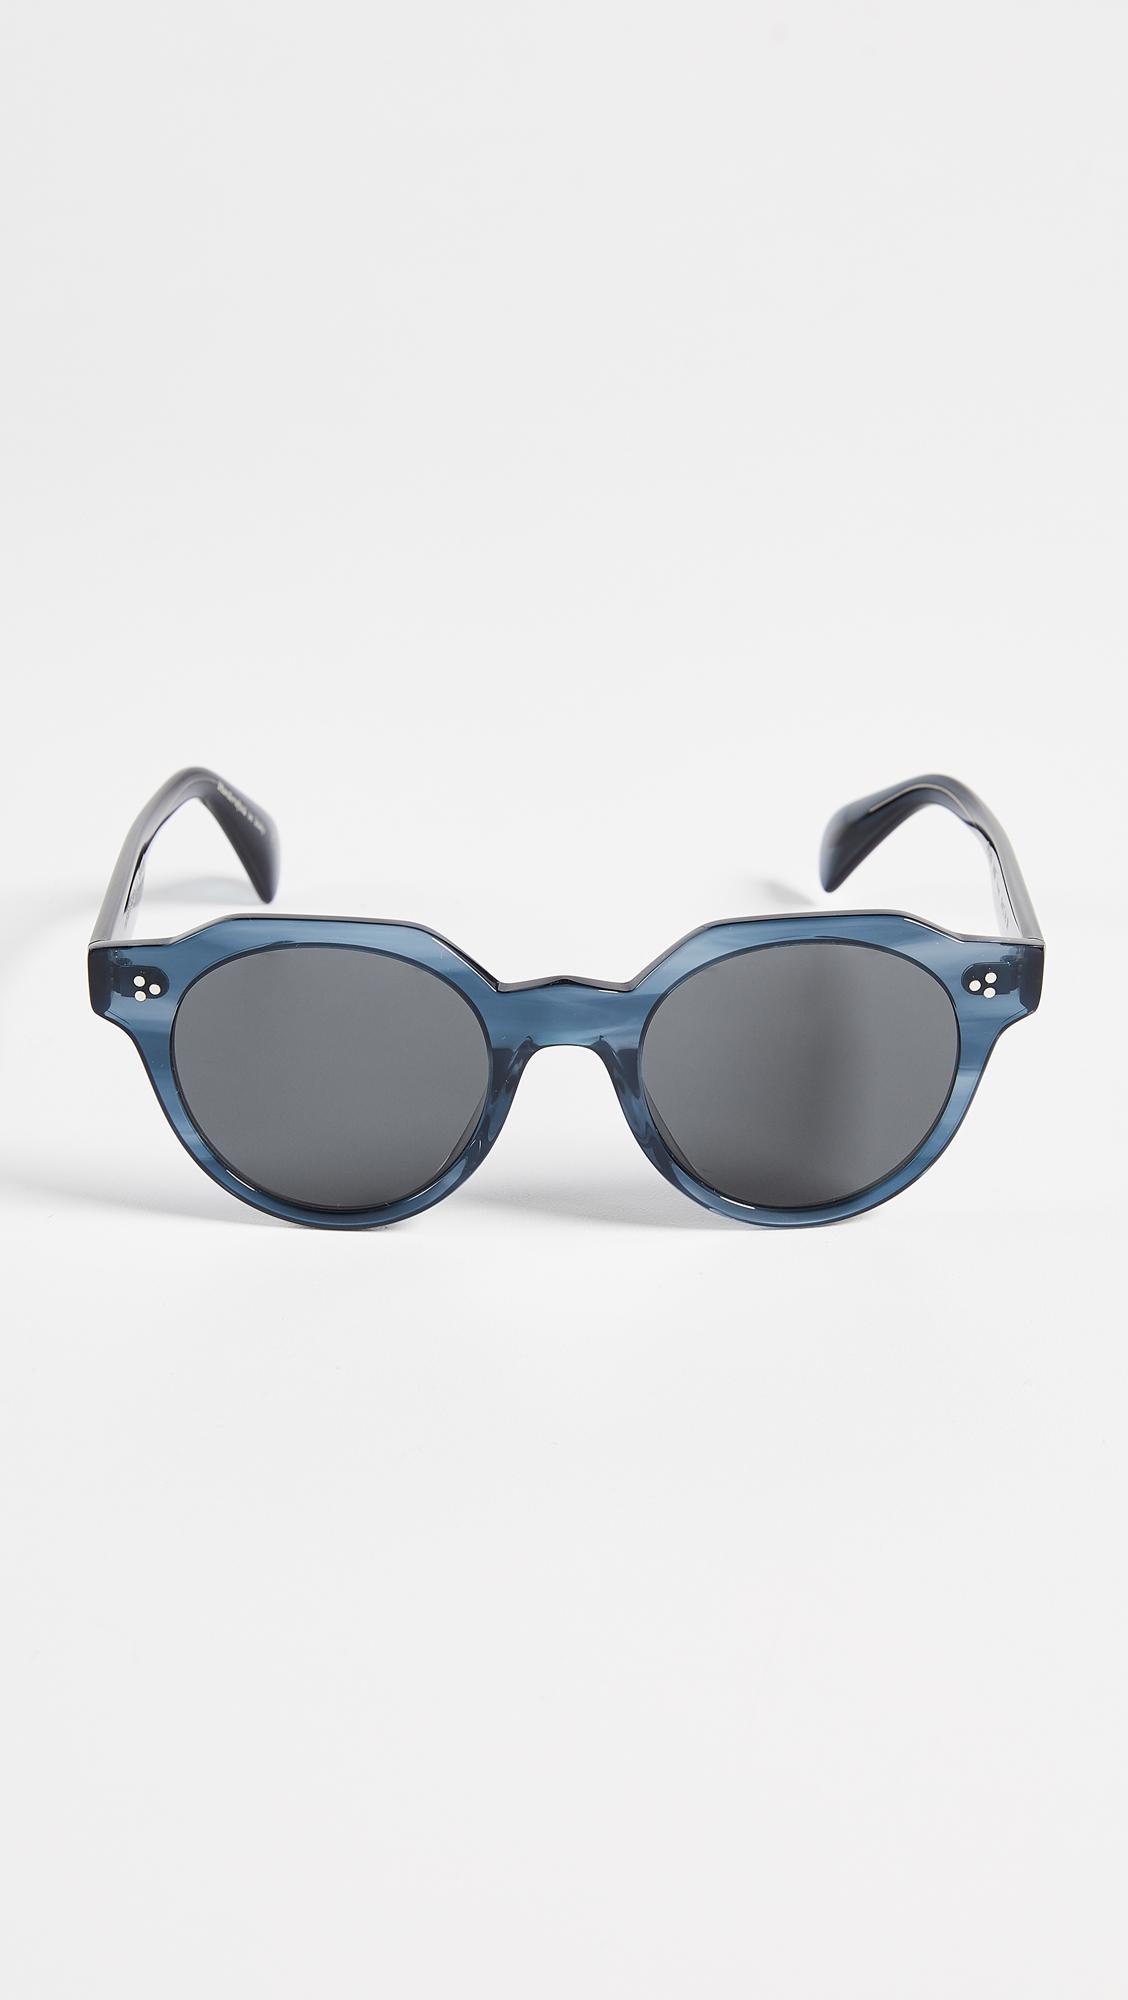 3e585871e8f Lyst - Oliver Peoples Irven Sunglasses in Gray for Men